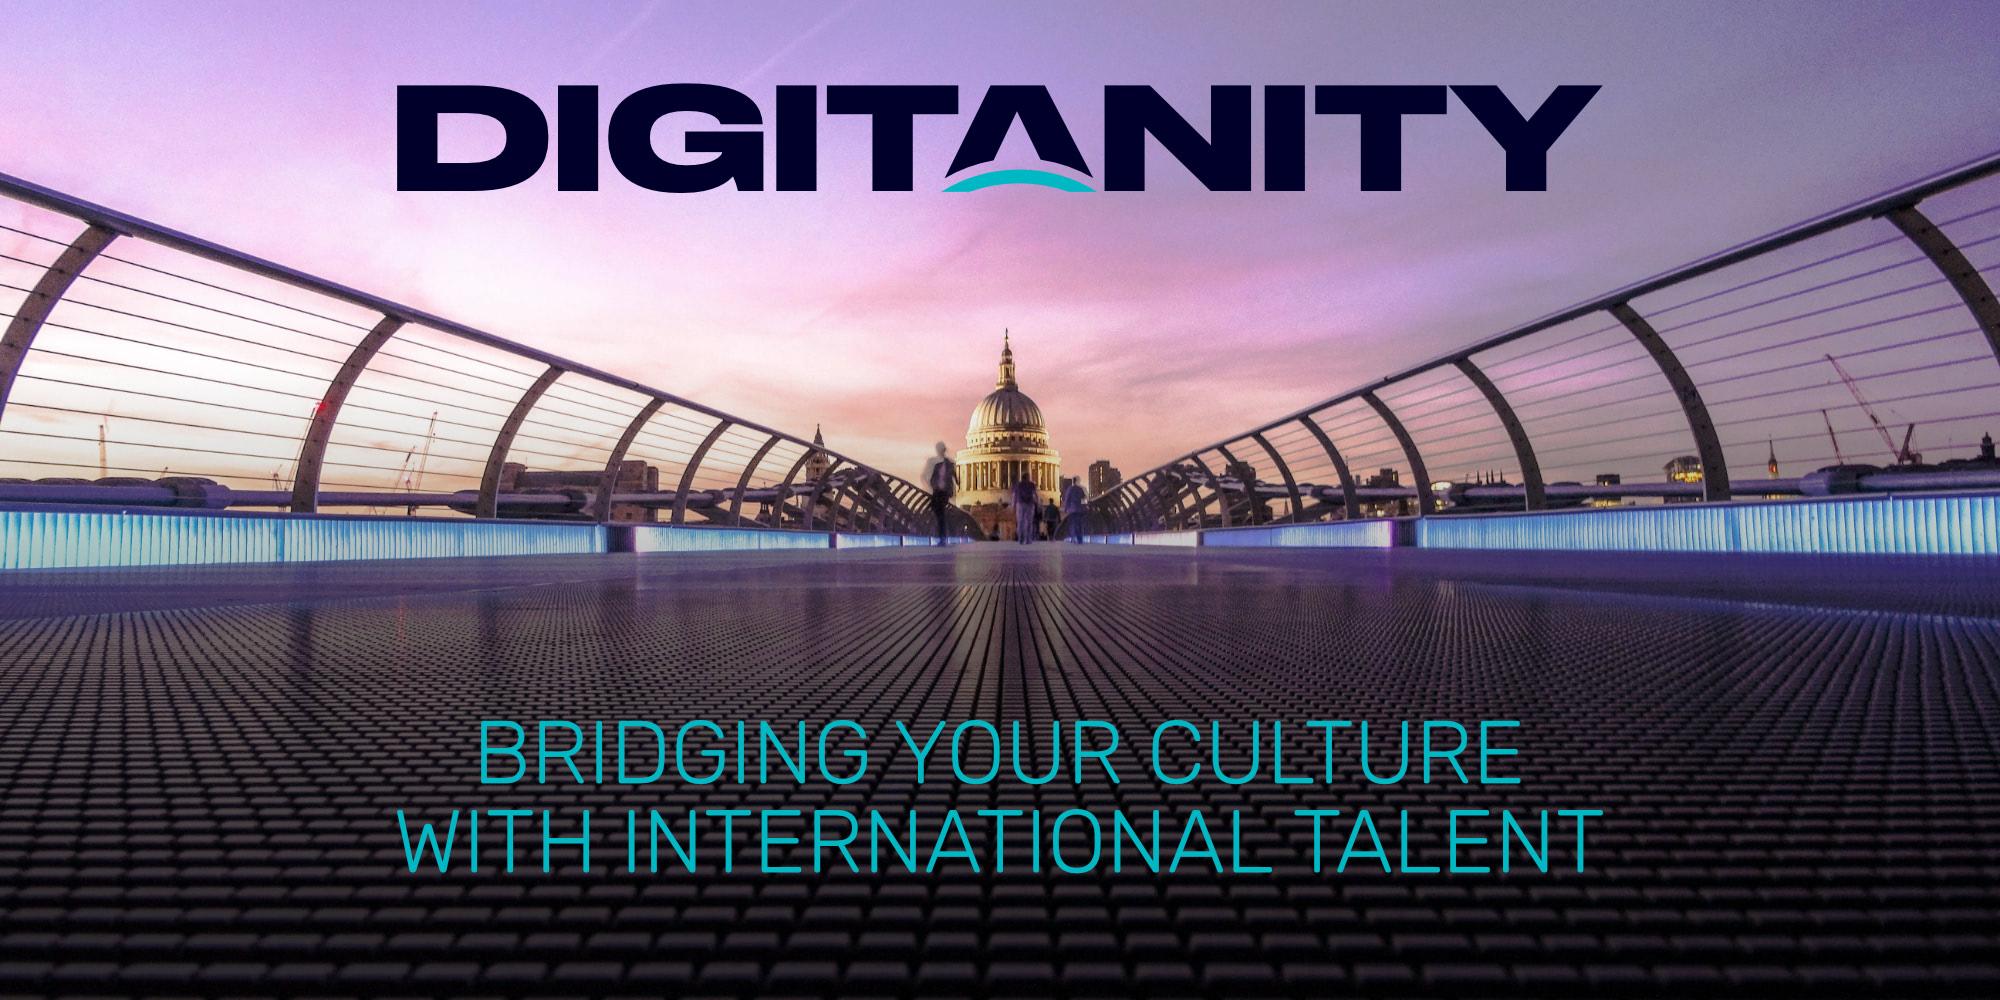 Digitanity launch